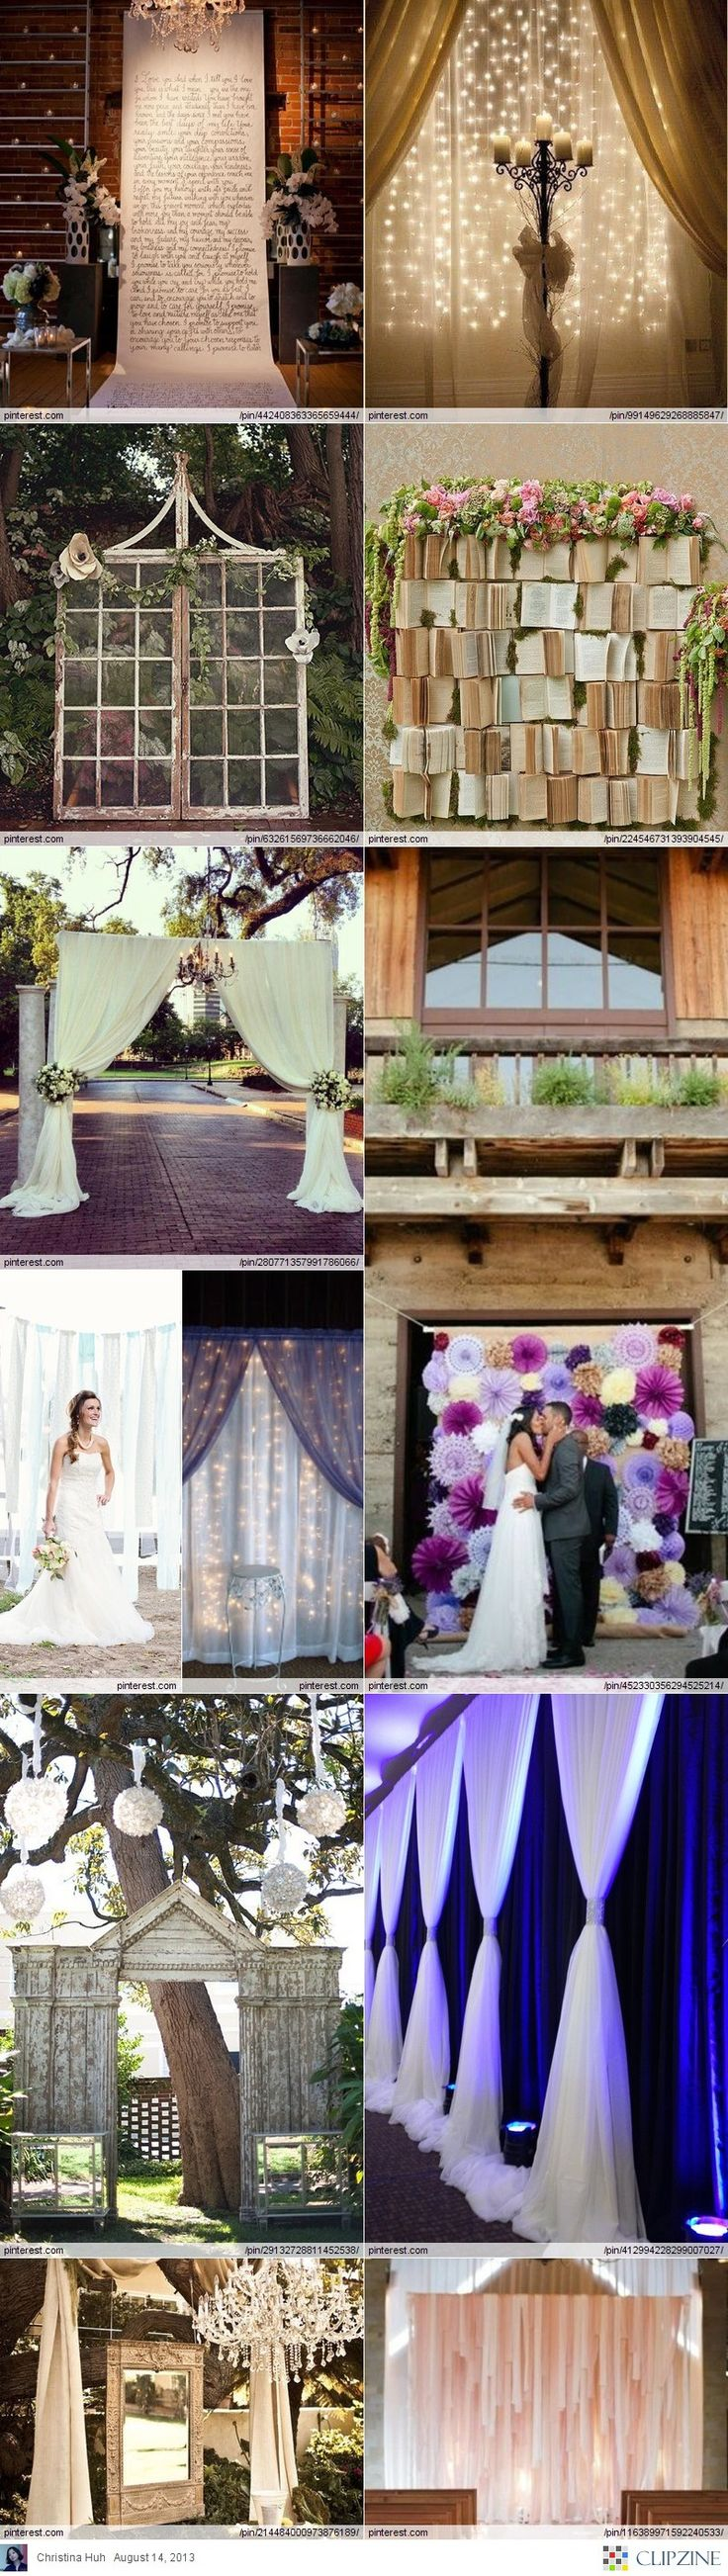 Wedding Backdrop DIY Ideas ***A Book backdrop, how sweet is that???